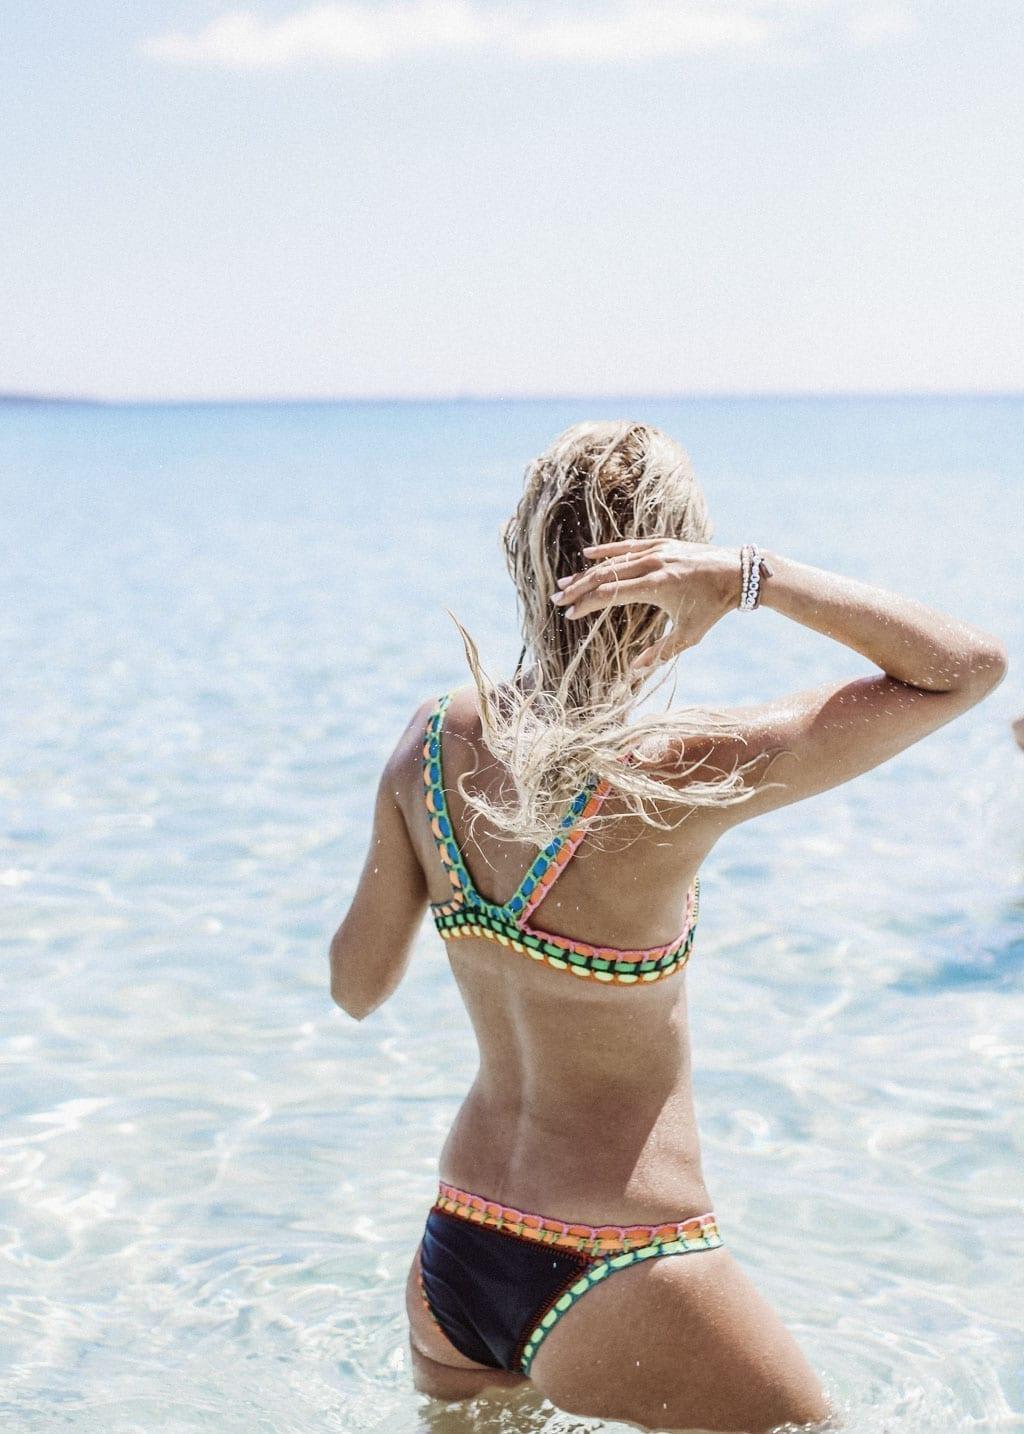 CK-1606_Sardinien-Sardegna-Sardinia-Italy-Italia-Fashion-Blog-Beach-Caribbean-Dress-Blonde-Karin-Kaswurm-Bikini-Kiini-9951